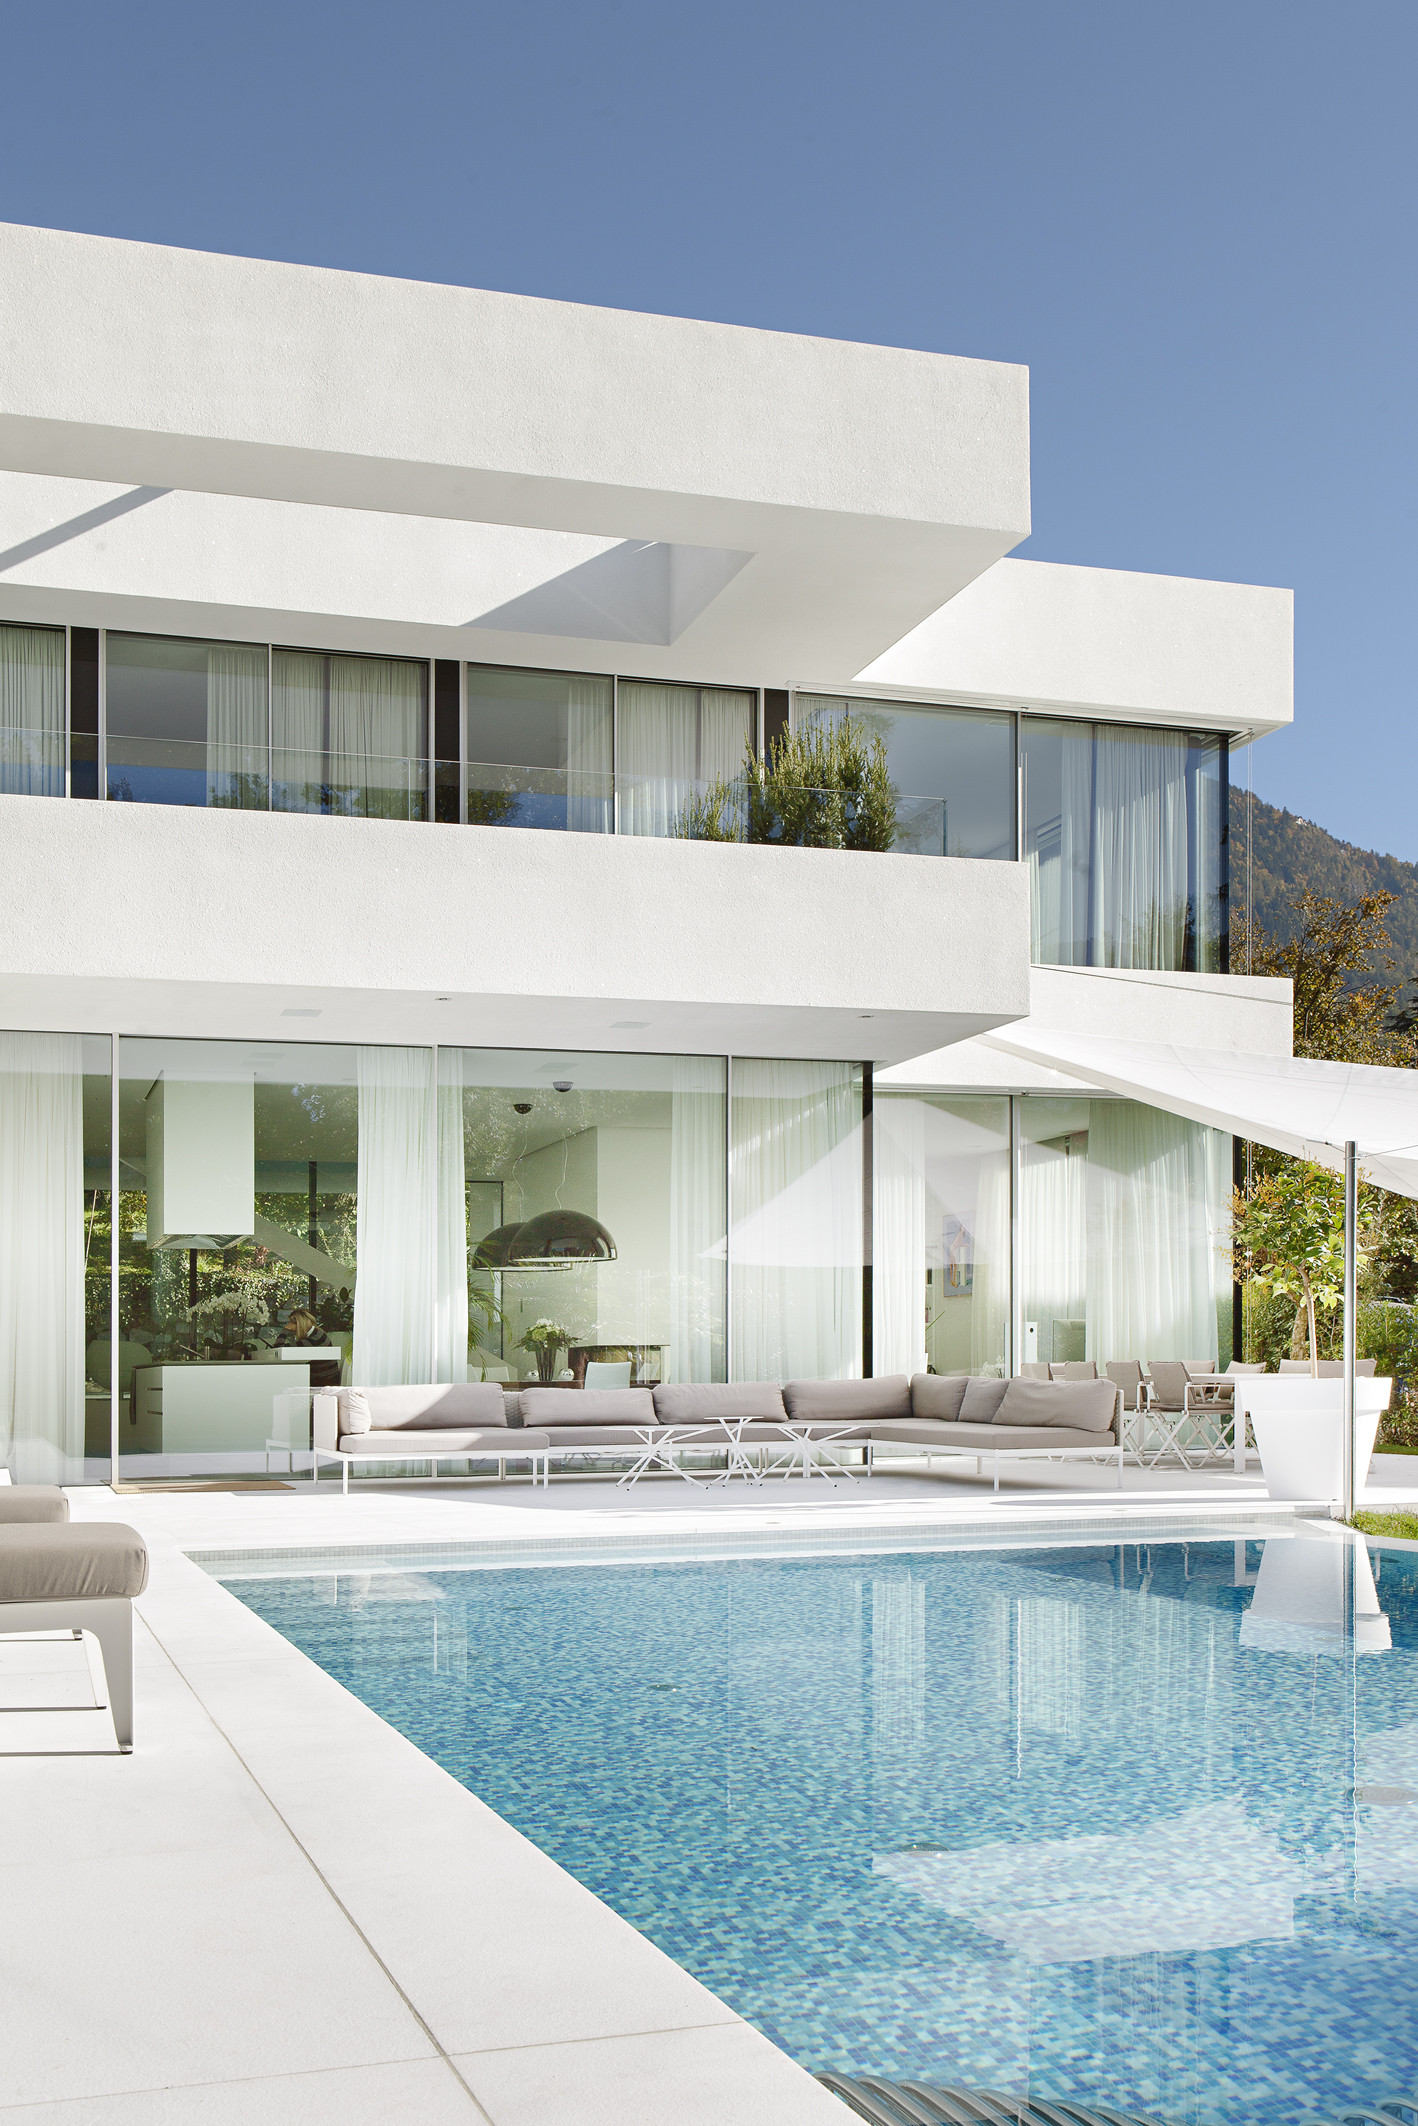 Gallery Of House M Monovolume Architecture Design 12